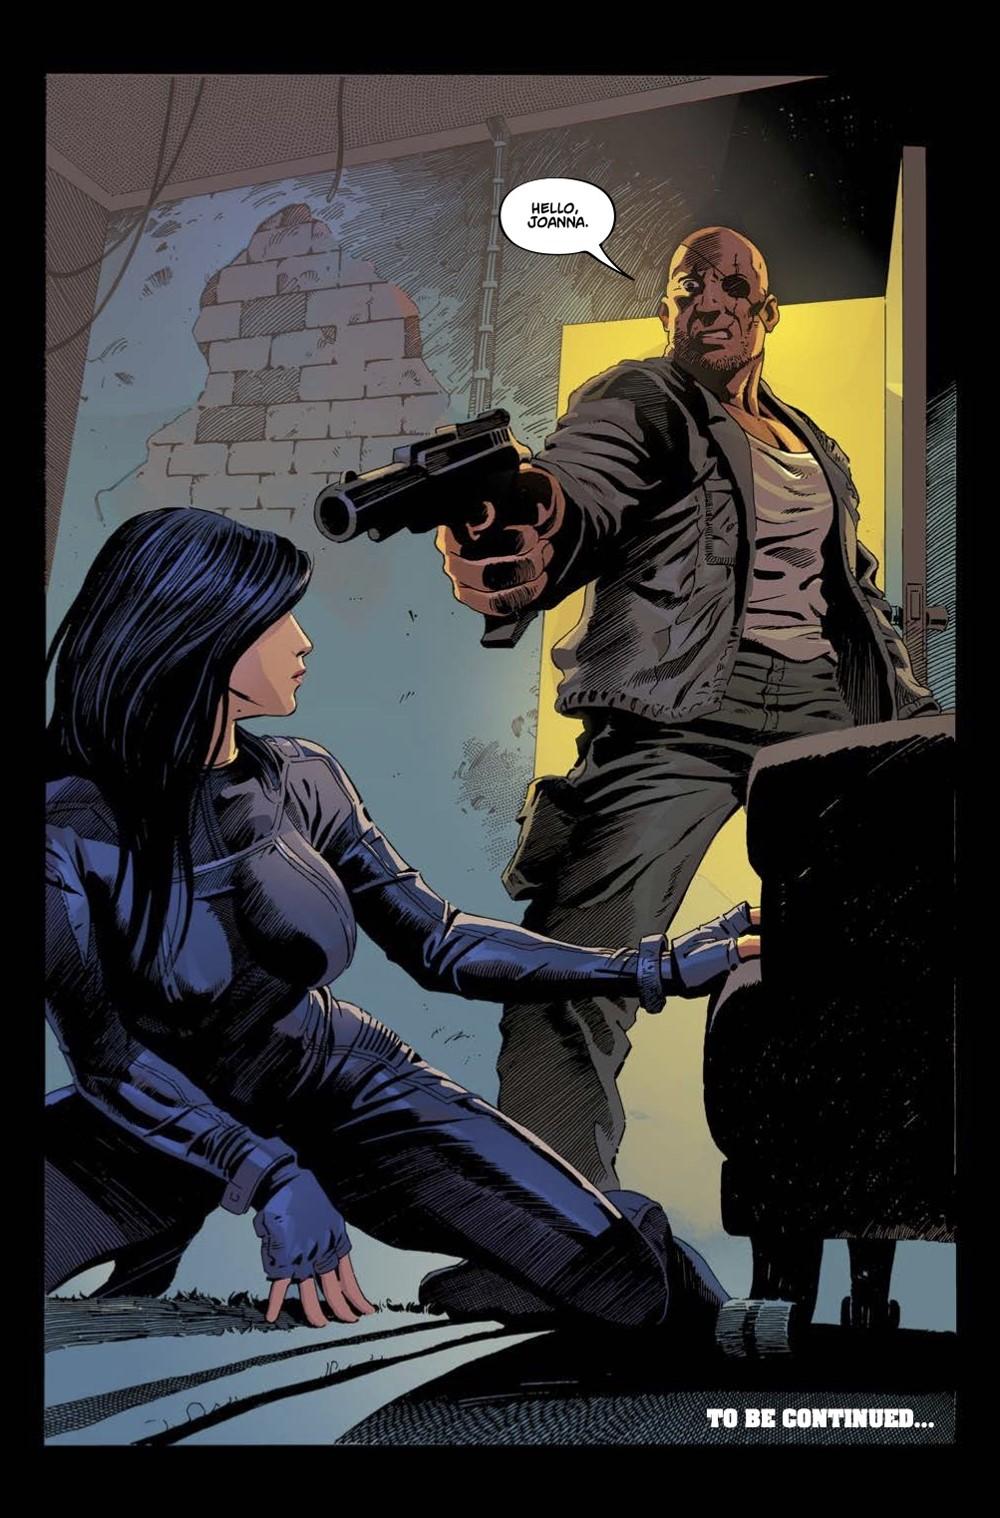 7 ComicList Previews: GUN HONEY #1